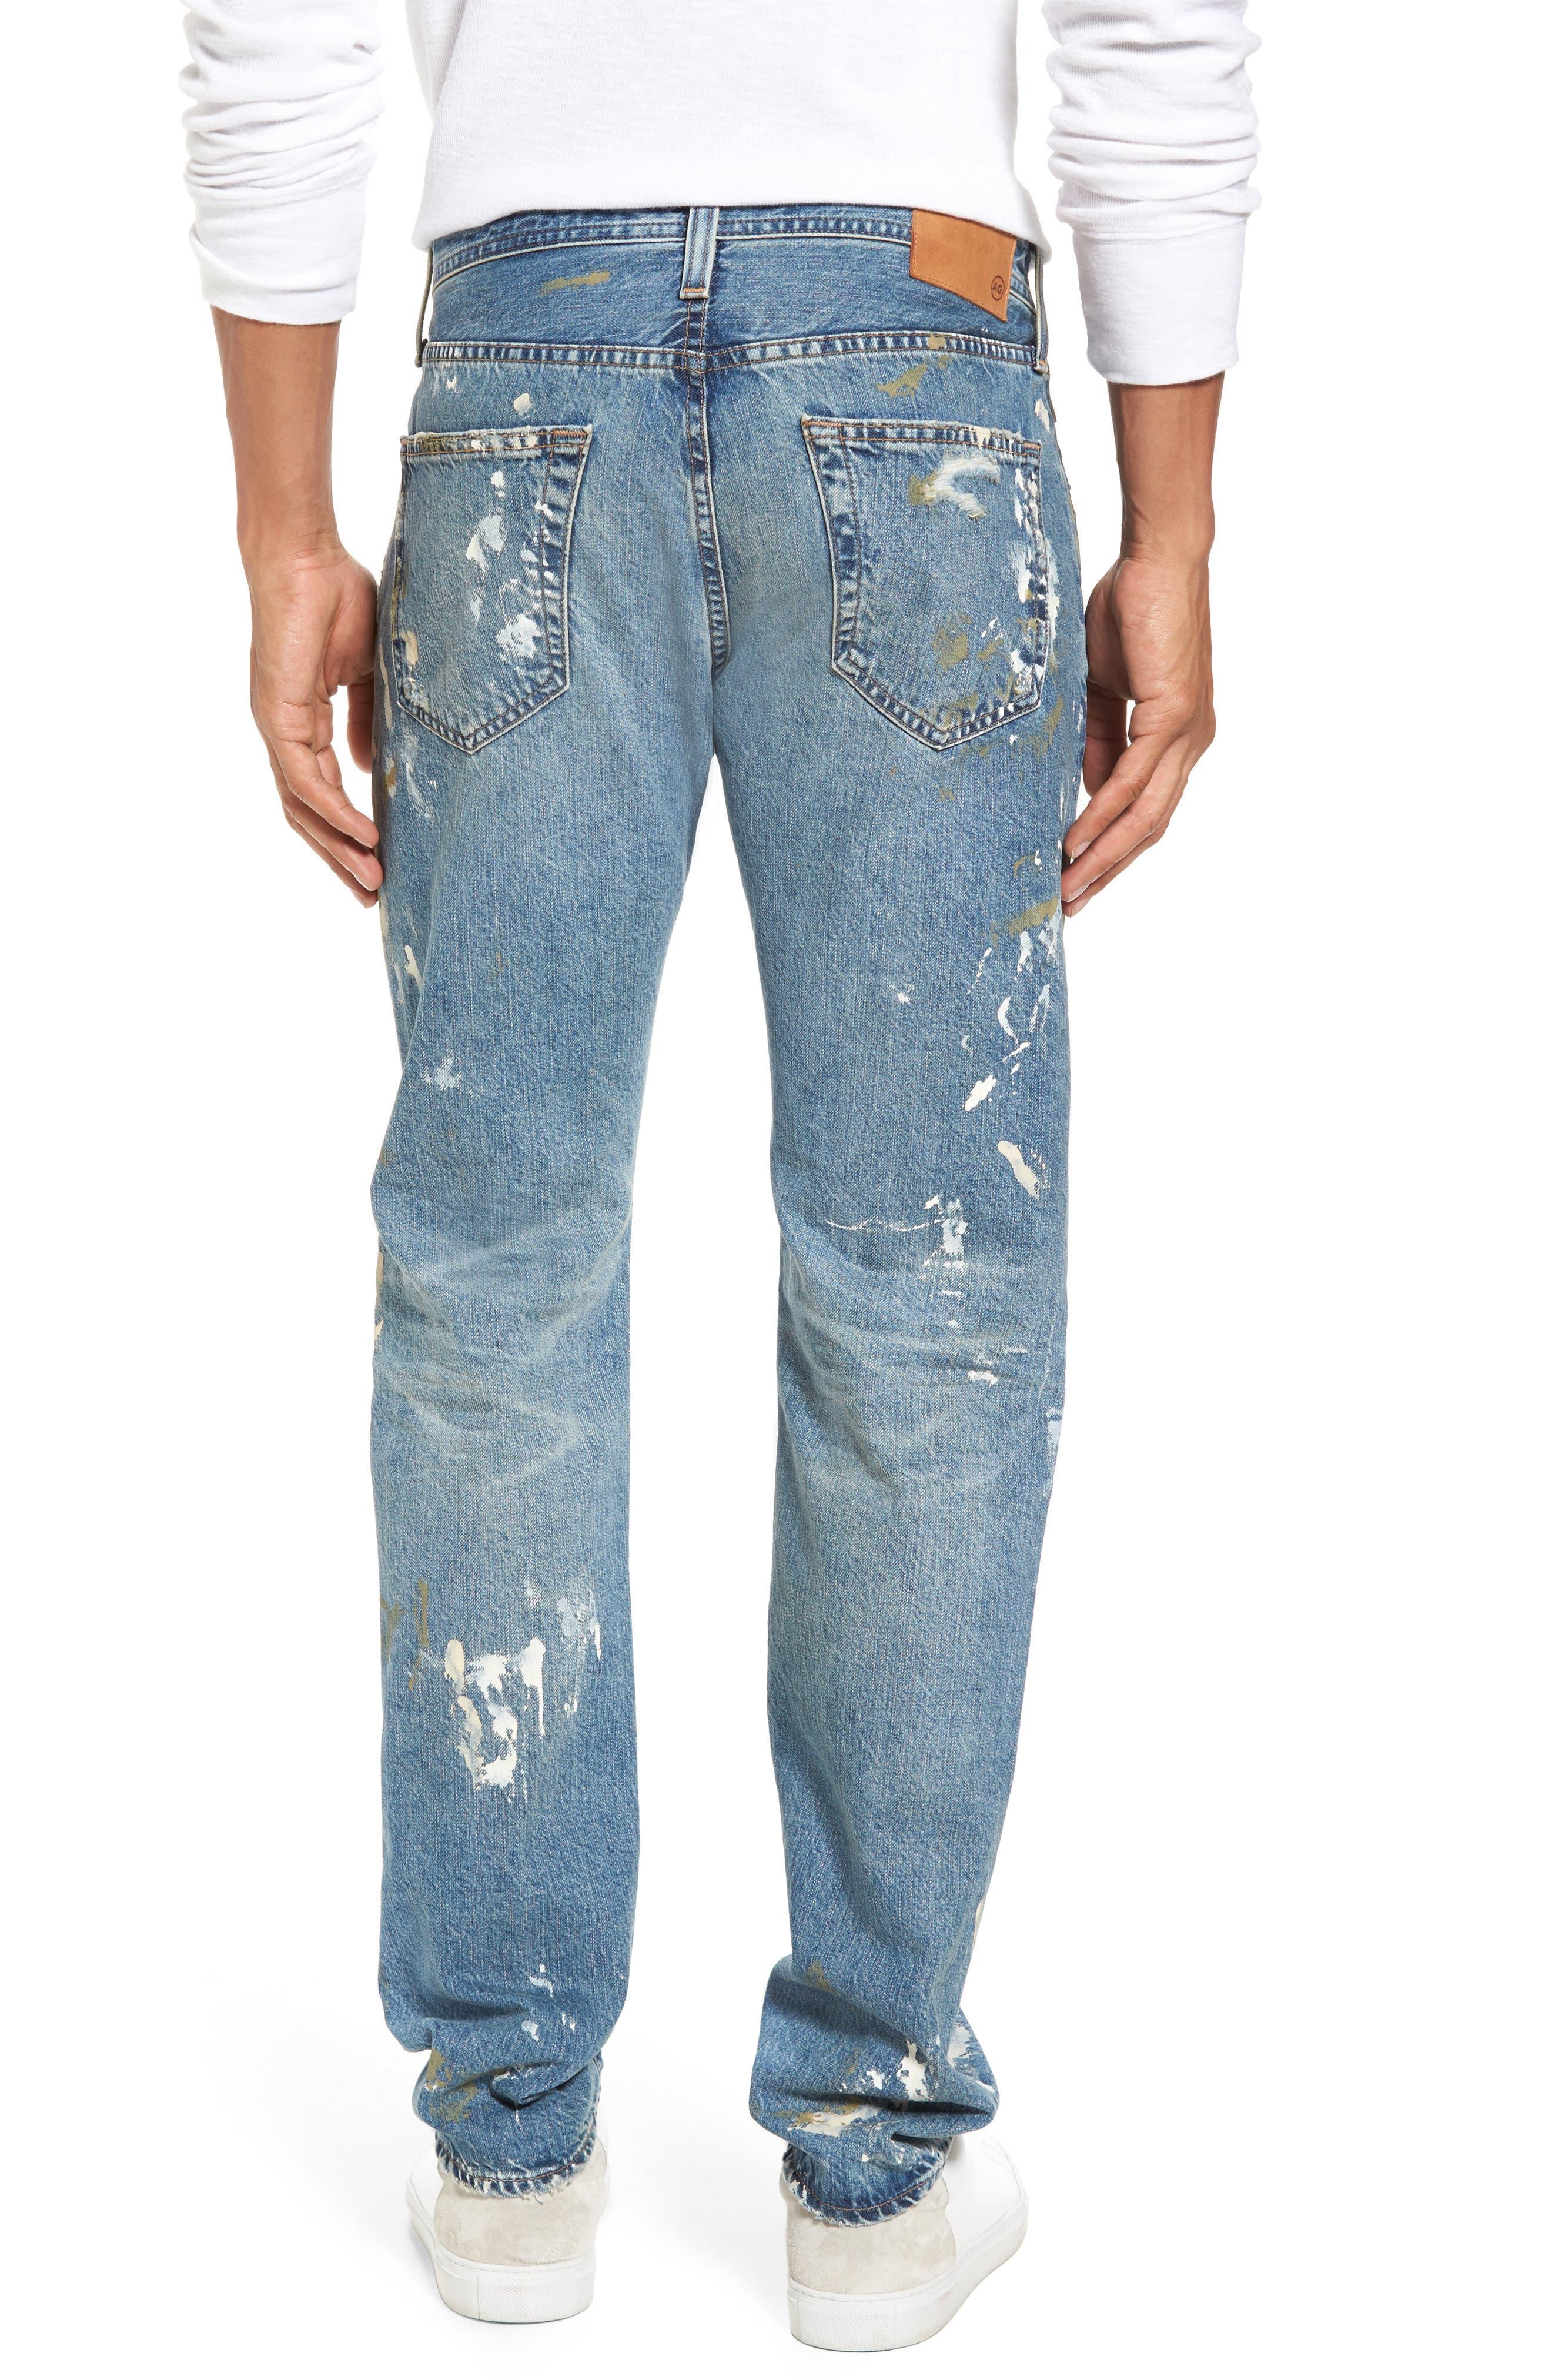 Tellis Modern Slim Fit Jeans,                             Alternate thumbnail 2, color,                             18 Years Carpenter